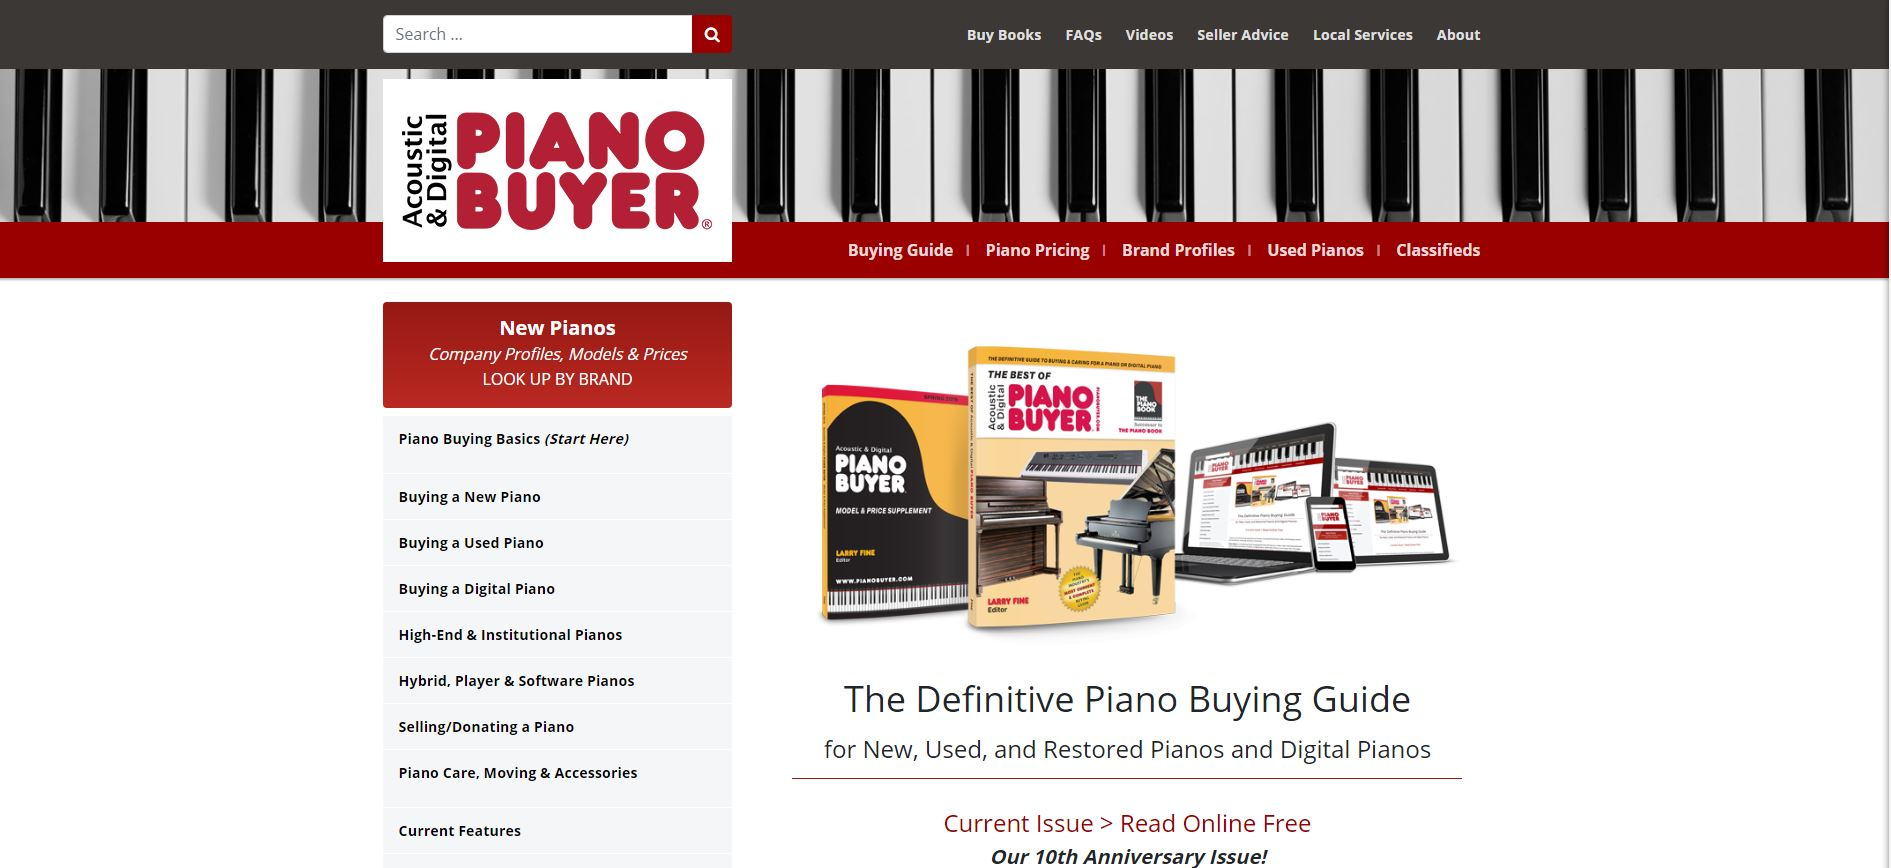 PianoBuyer.com